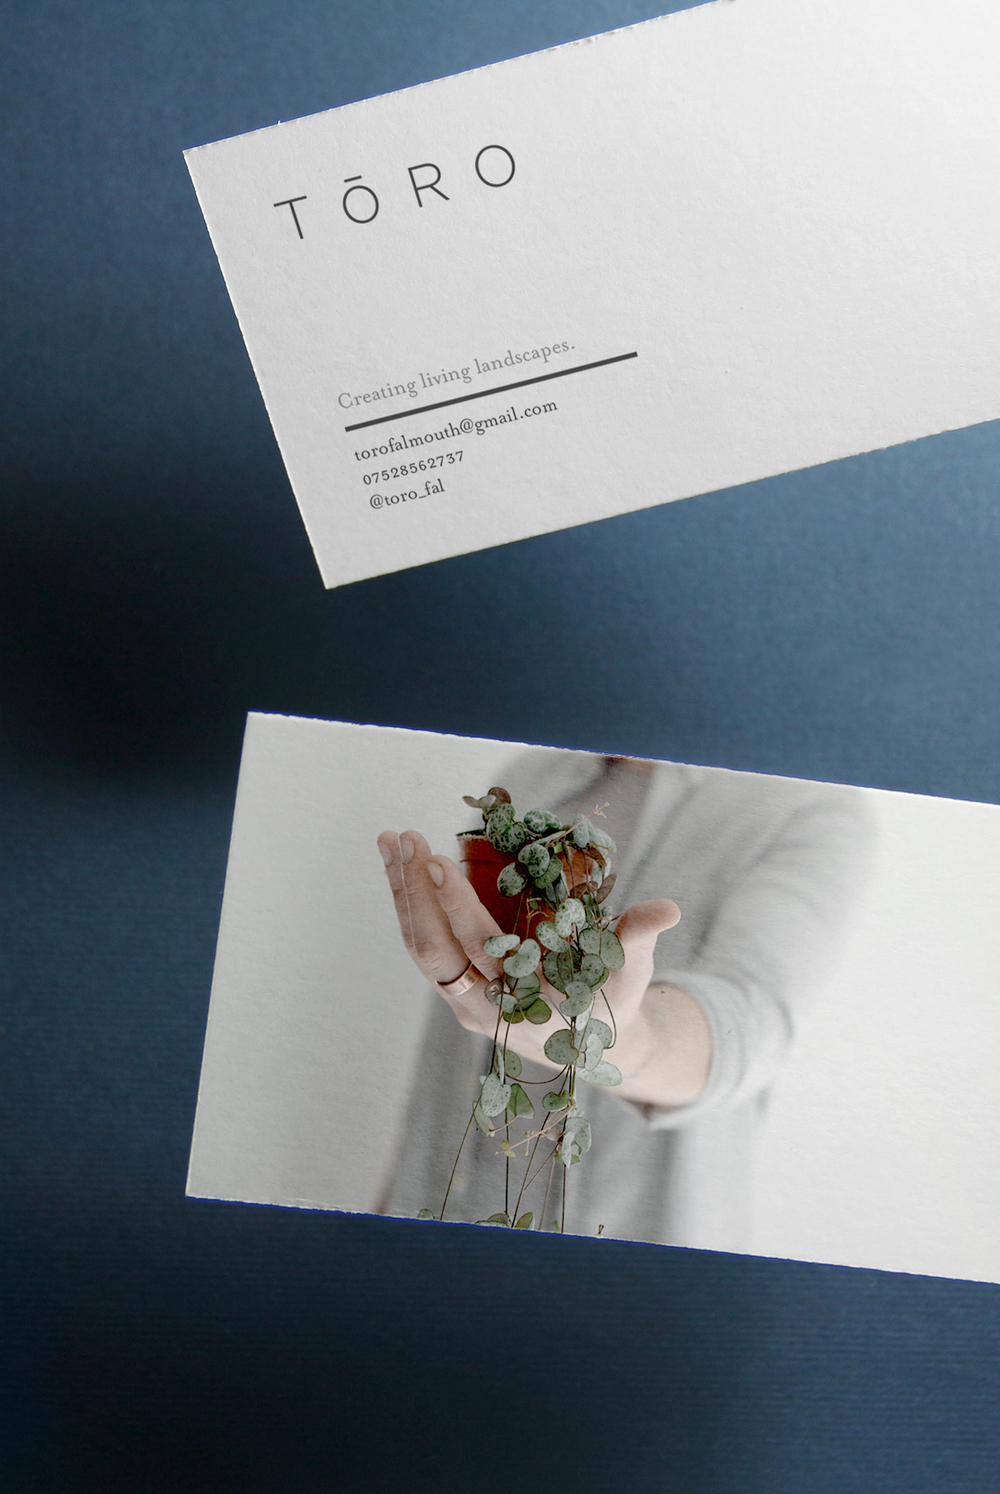 Toro Business Card Design